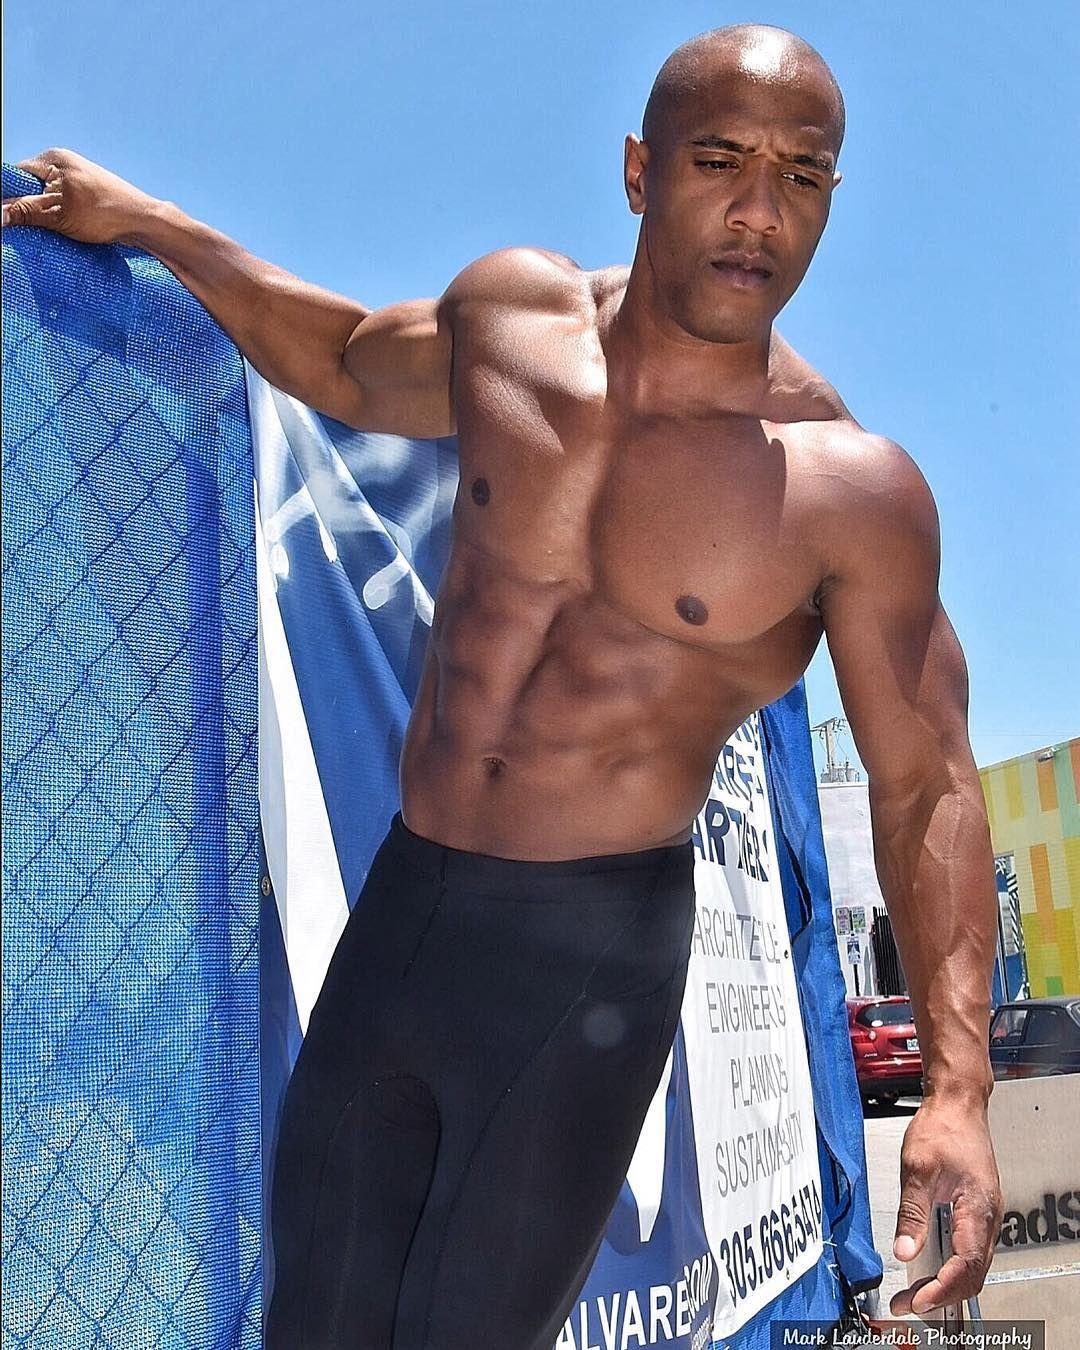 14 Vegan Bodybuilders Who Smash Vegan Stereotypes Peta Vegan Bodybuilding Bodybuilding Pictures Bodybuilders